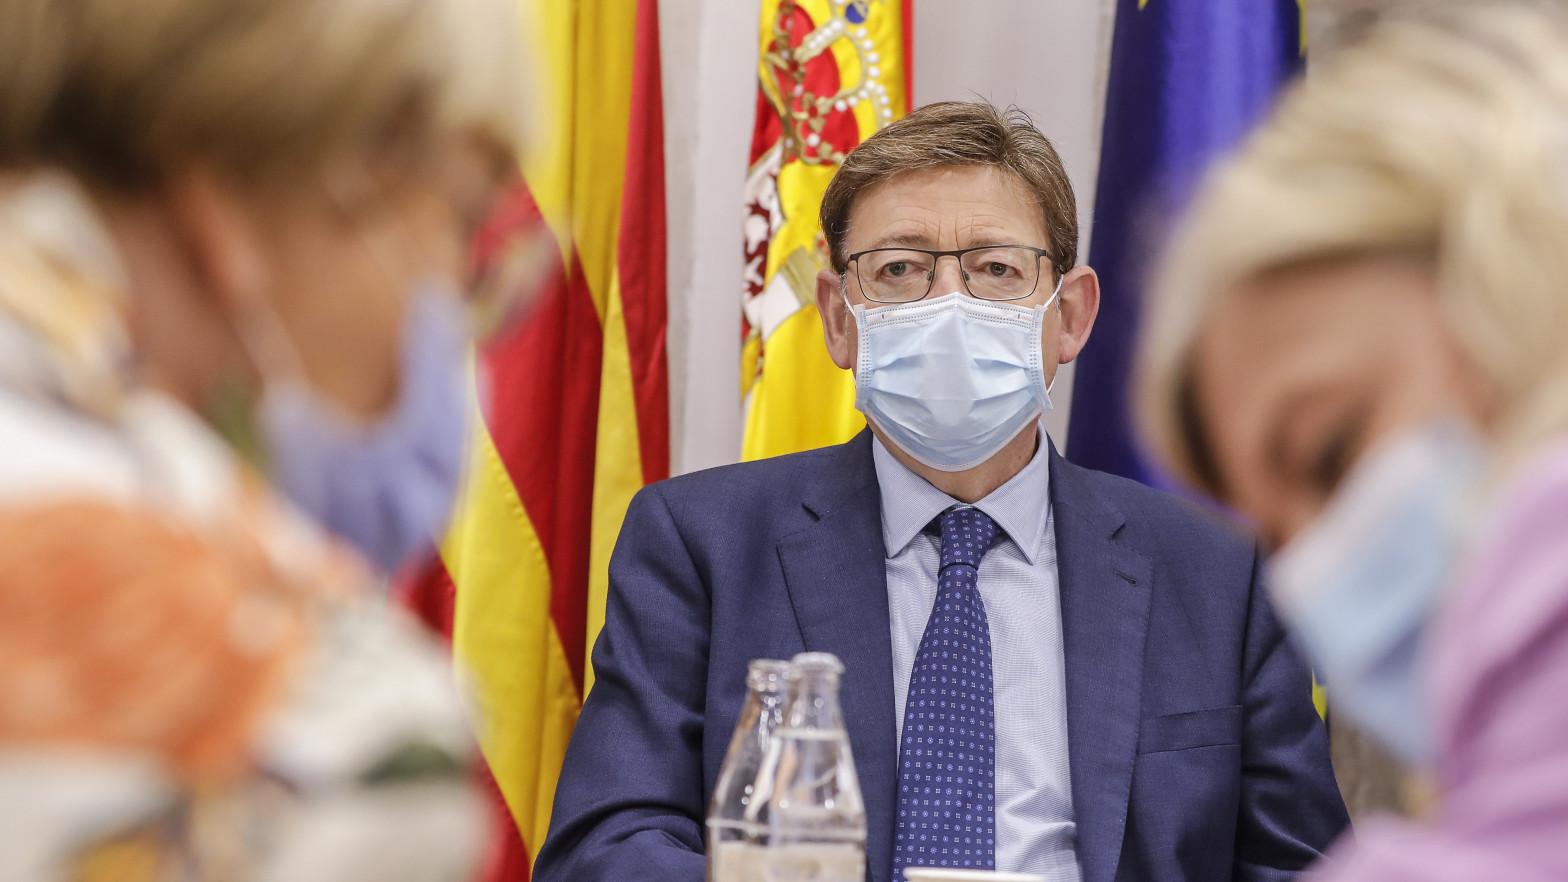 La vergüenza valenciana